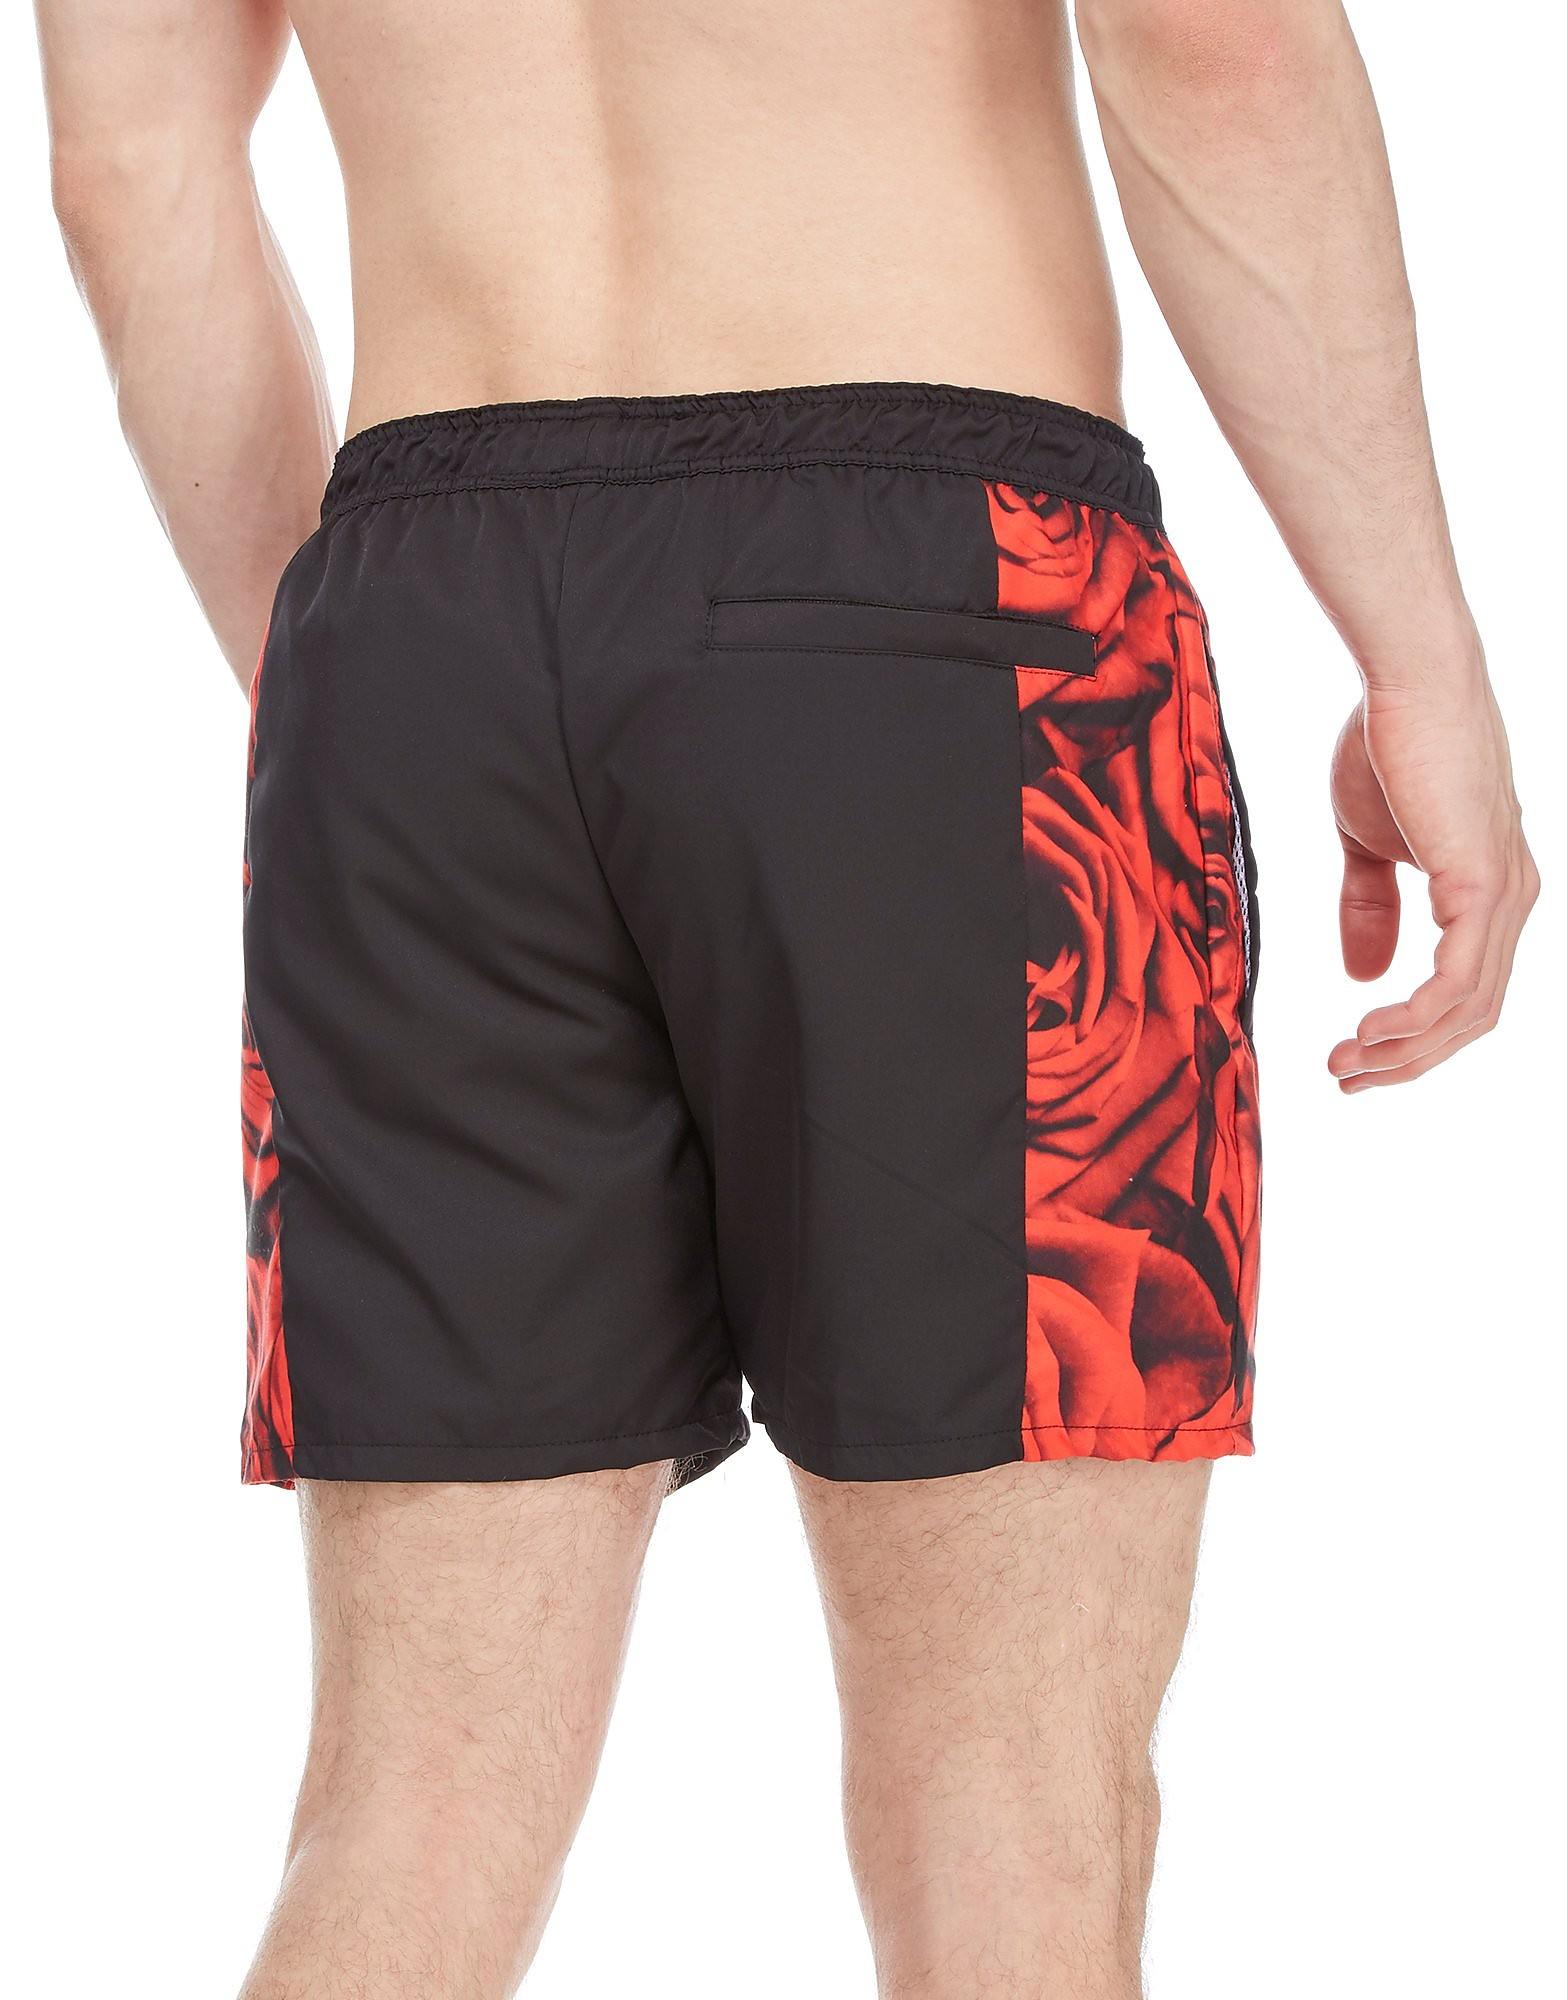 Supply & Demand Rose Side Swim Shorts